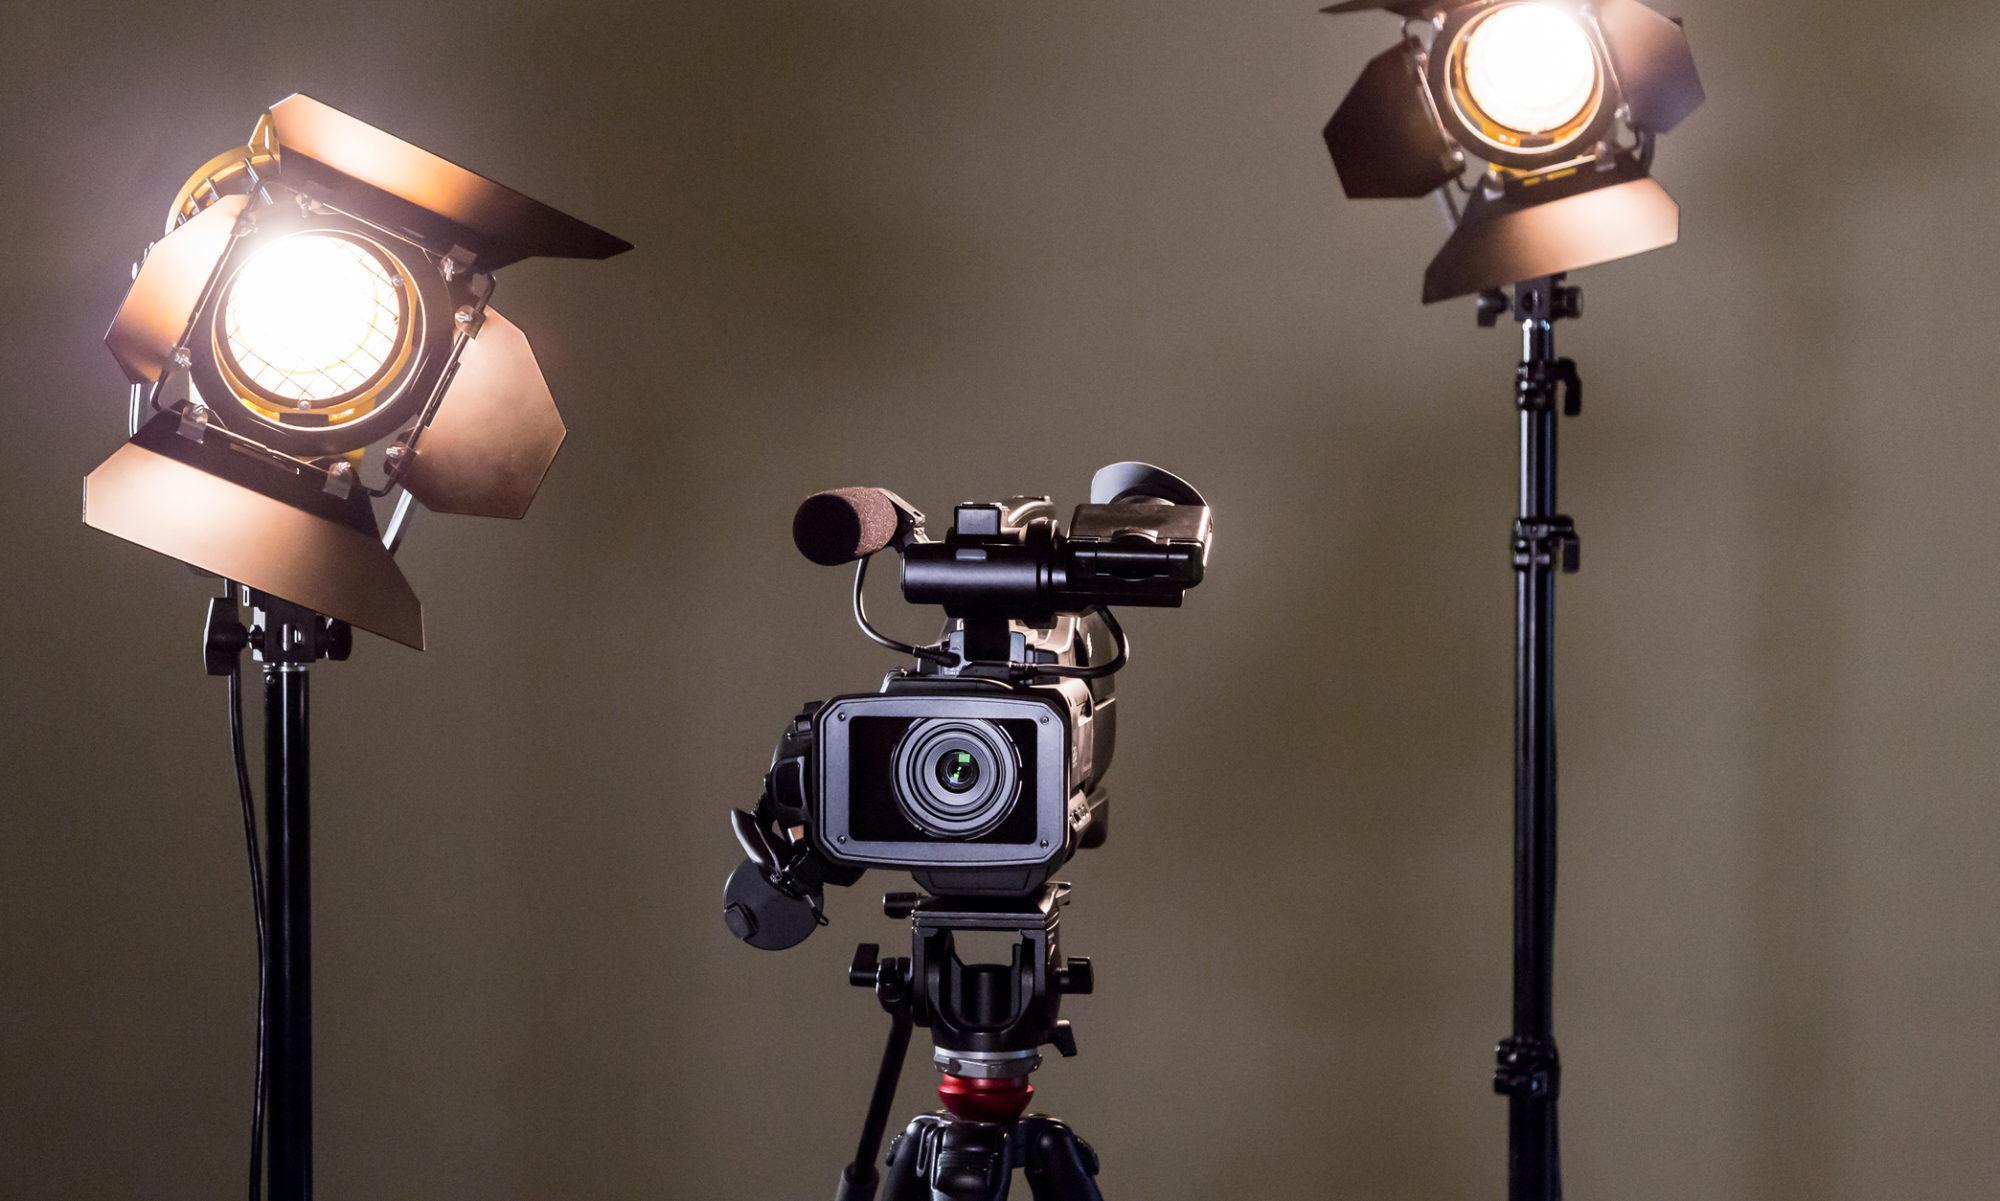 CORN Filmproduktion AB